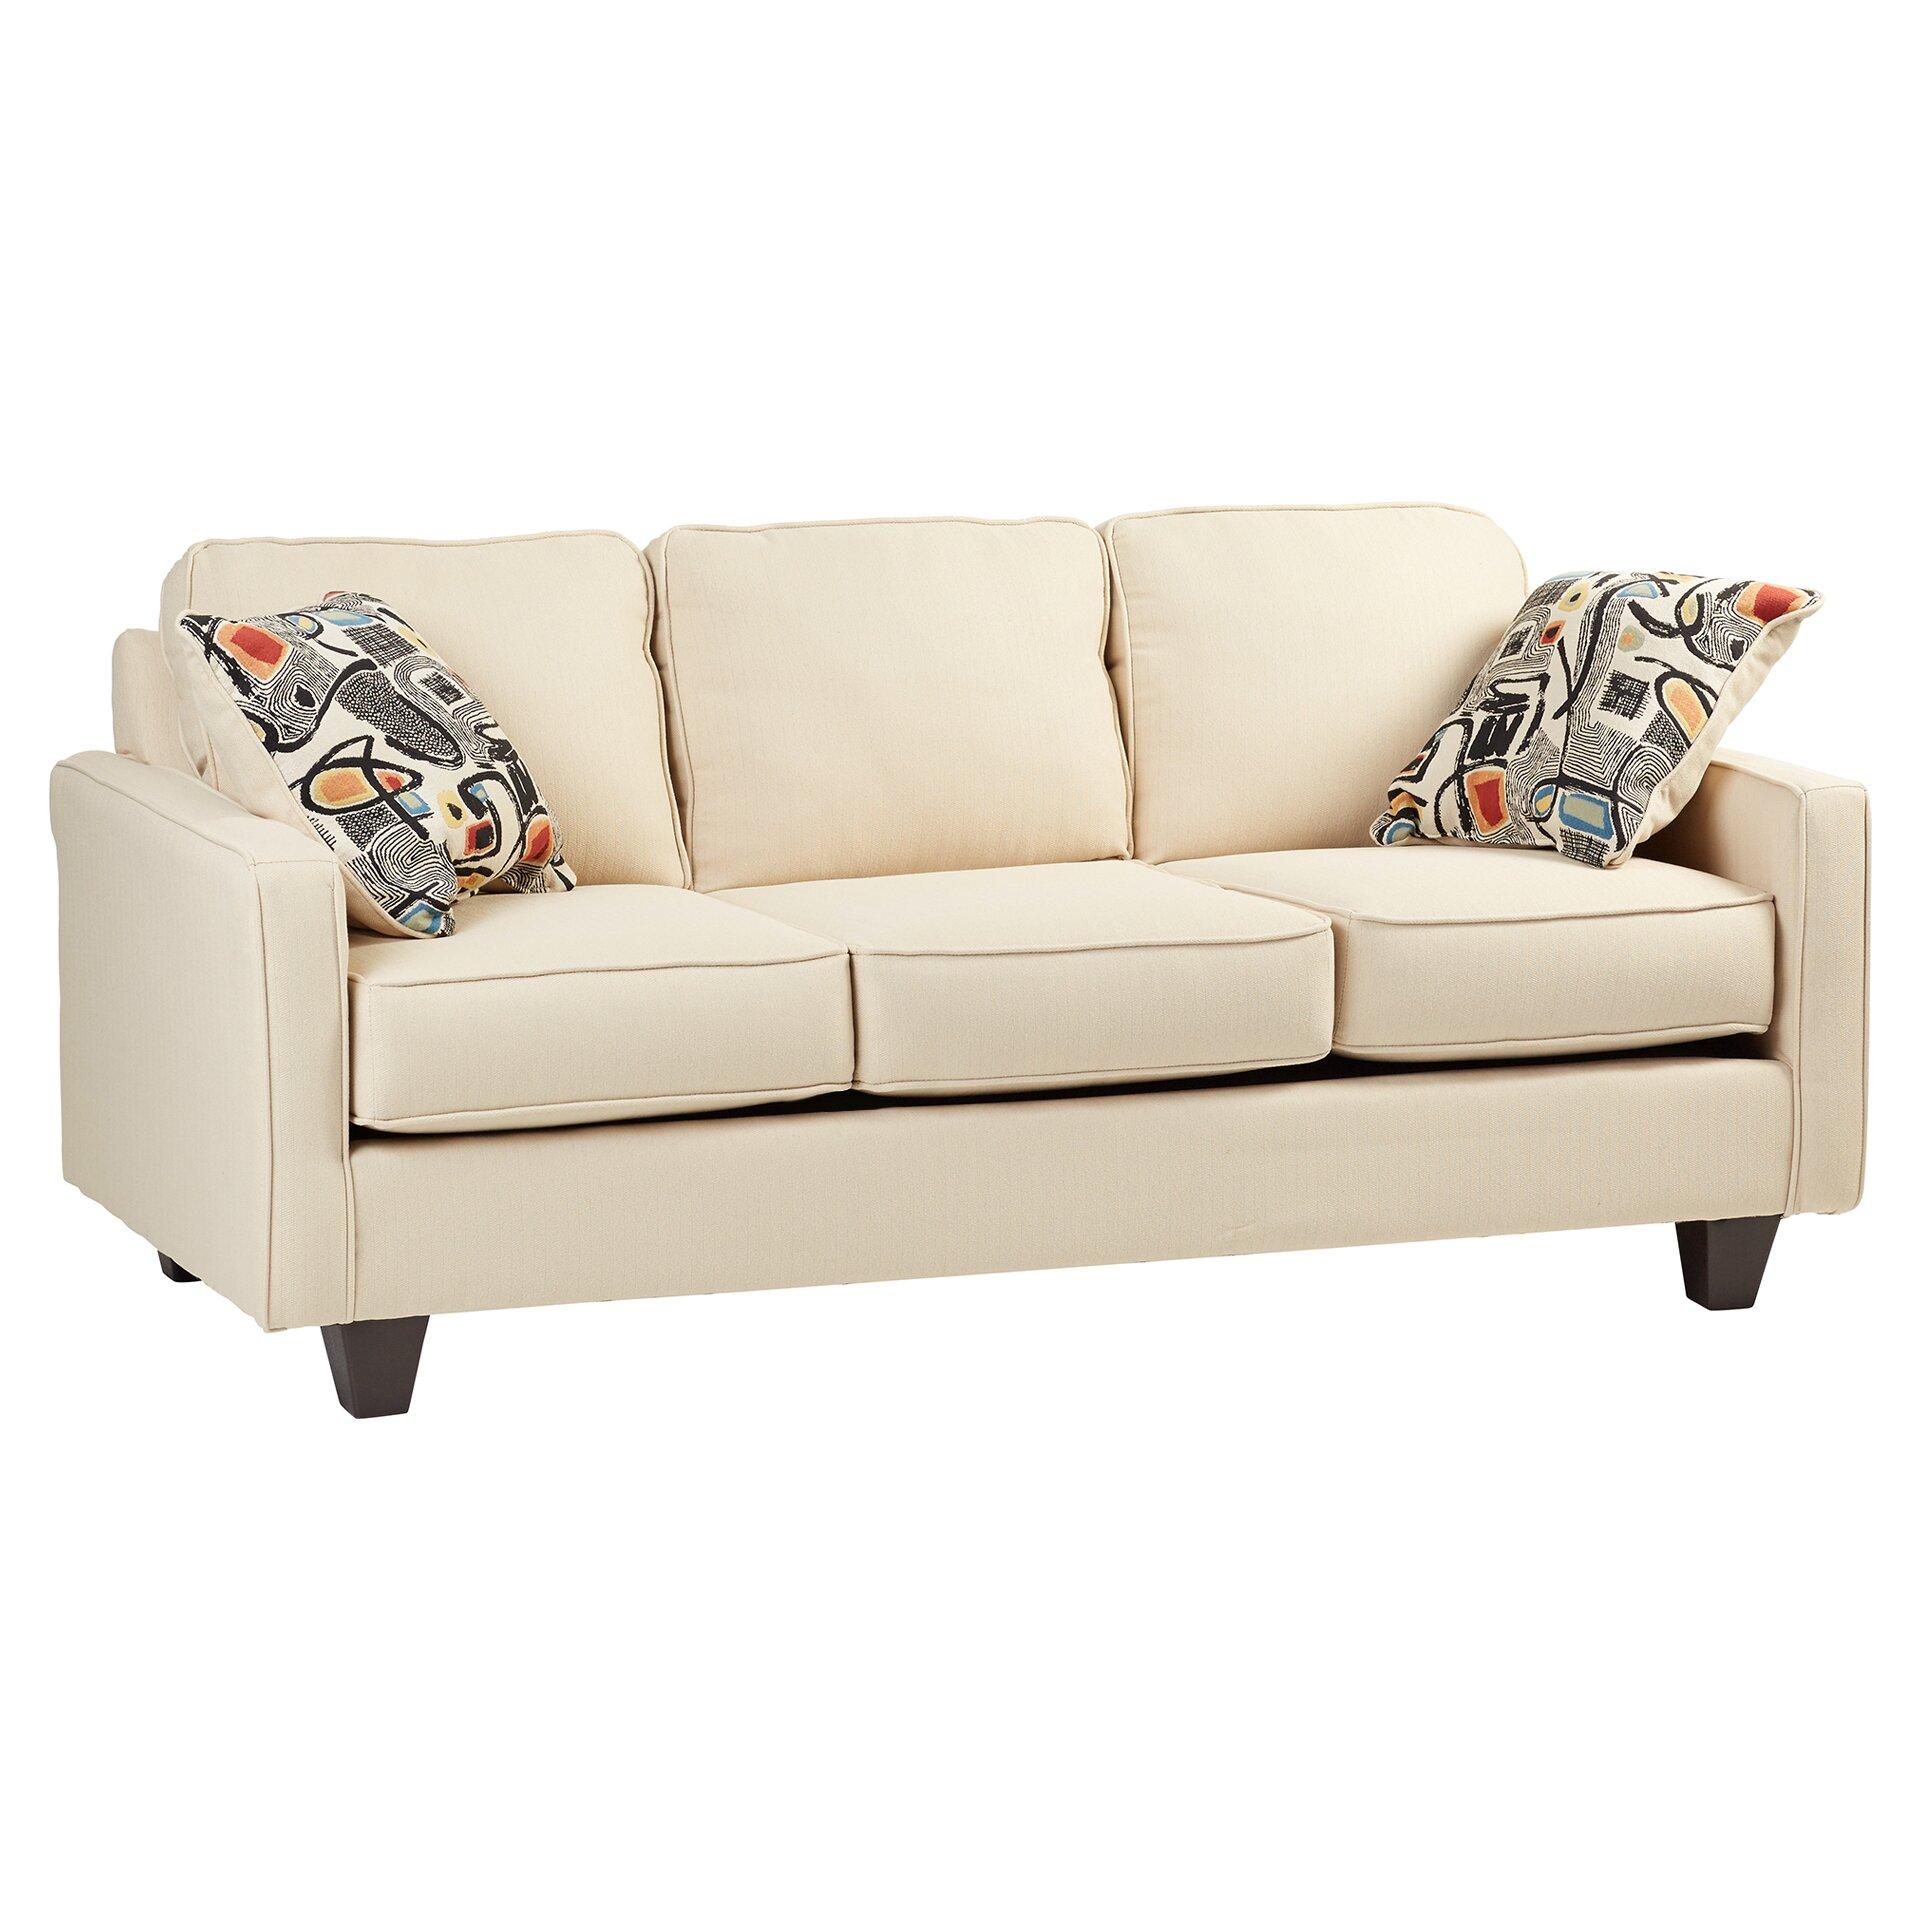 Ivy Bronx Serta Upholstery Liadan Sofa & Reviews